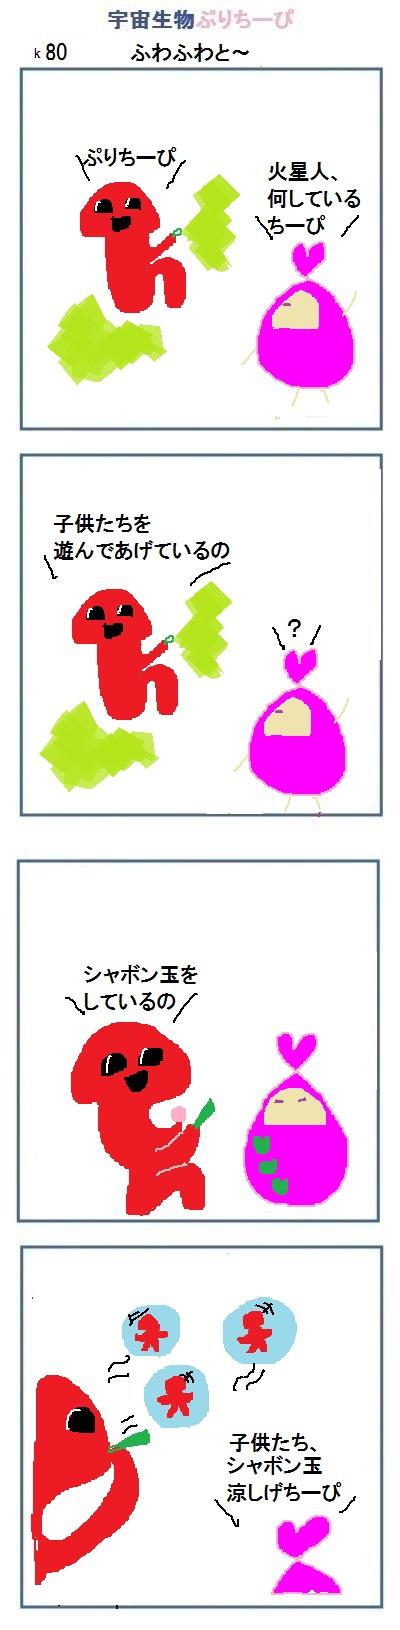 160824_k80